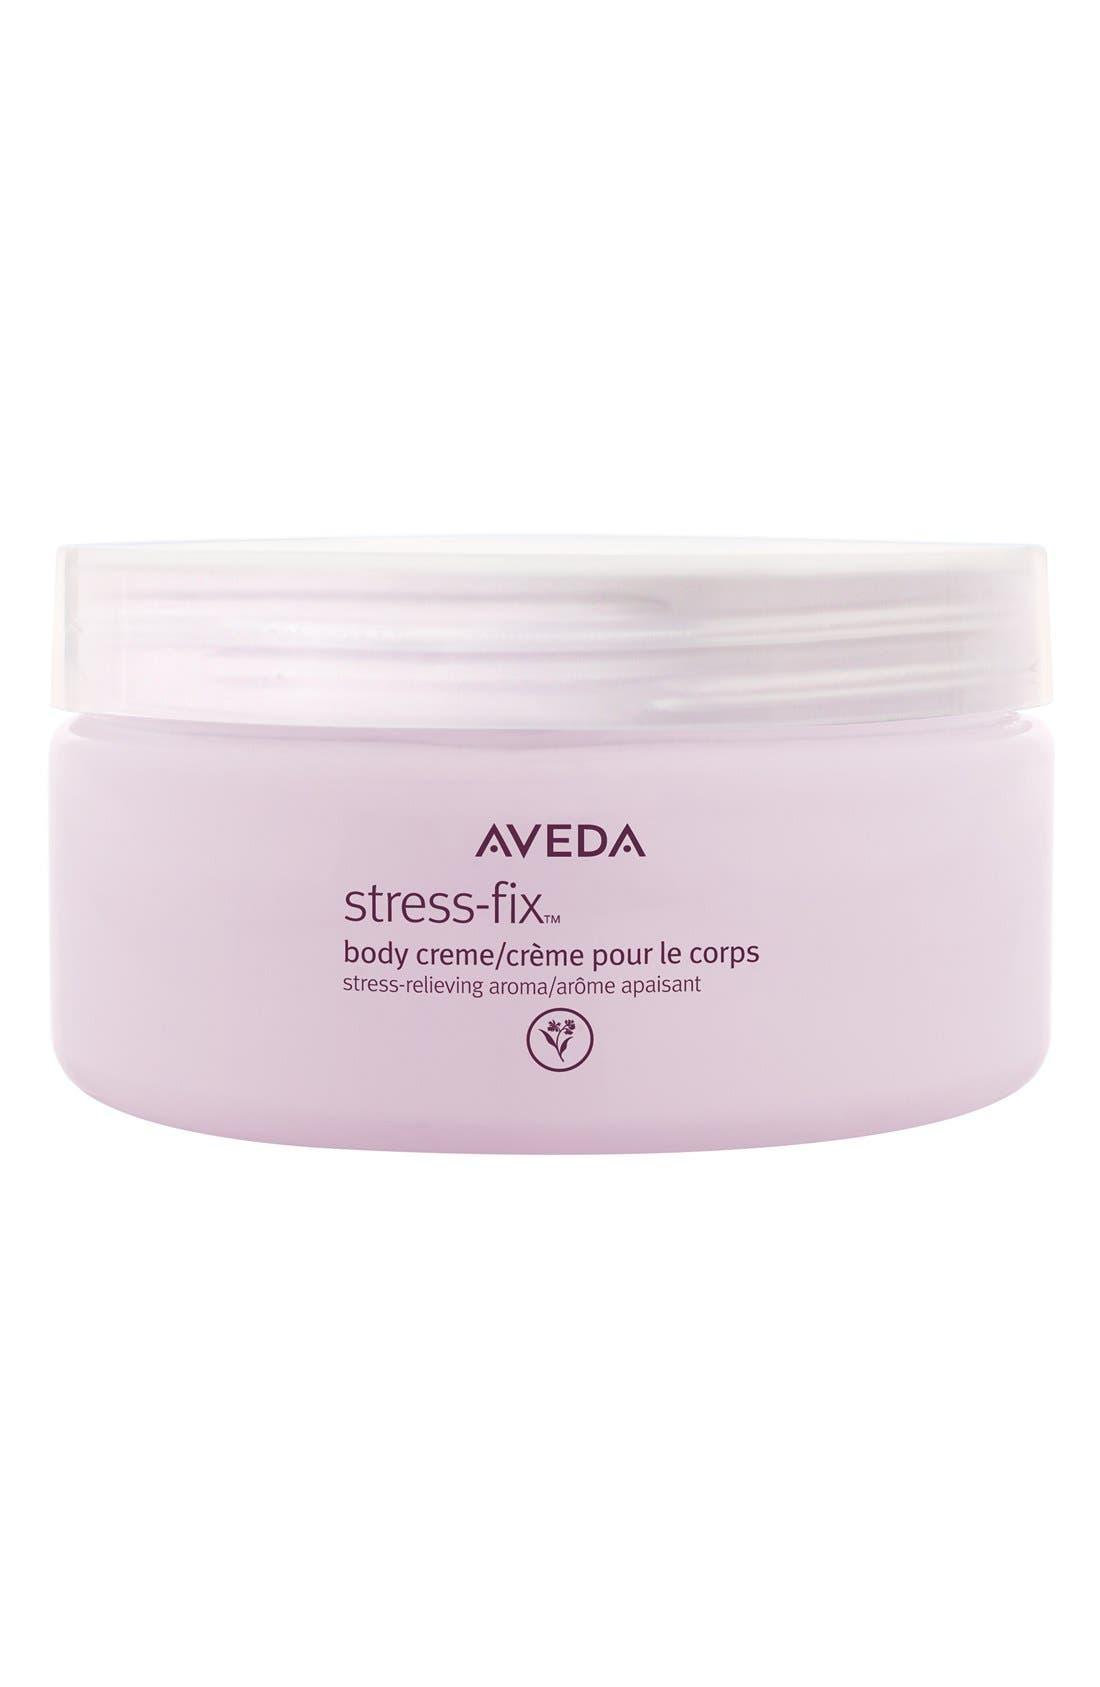 Aveda 'stress-fix™' Body Crème